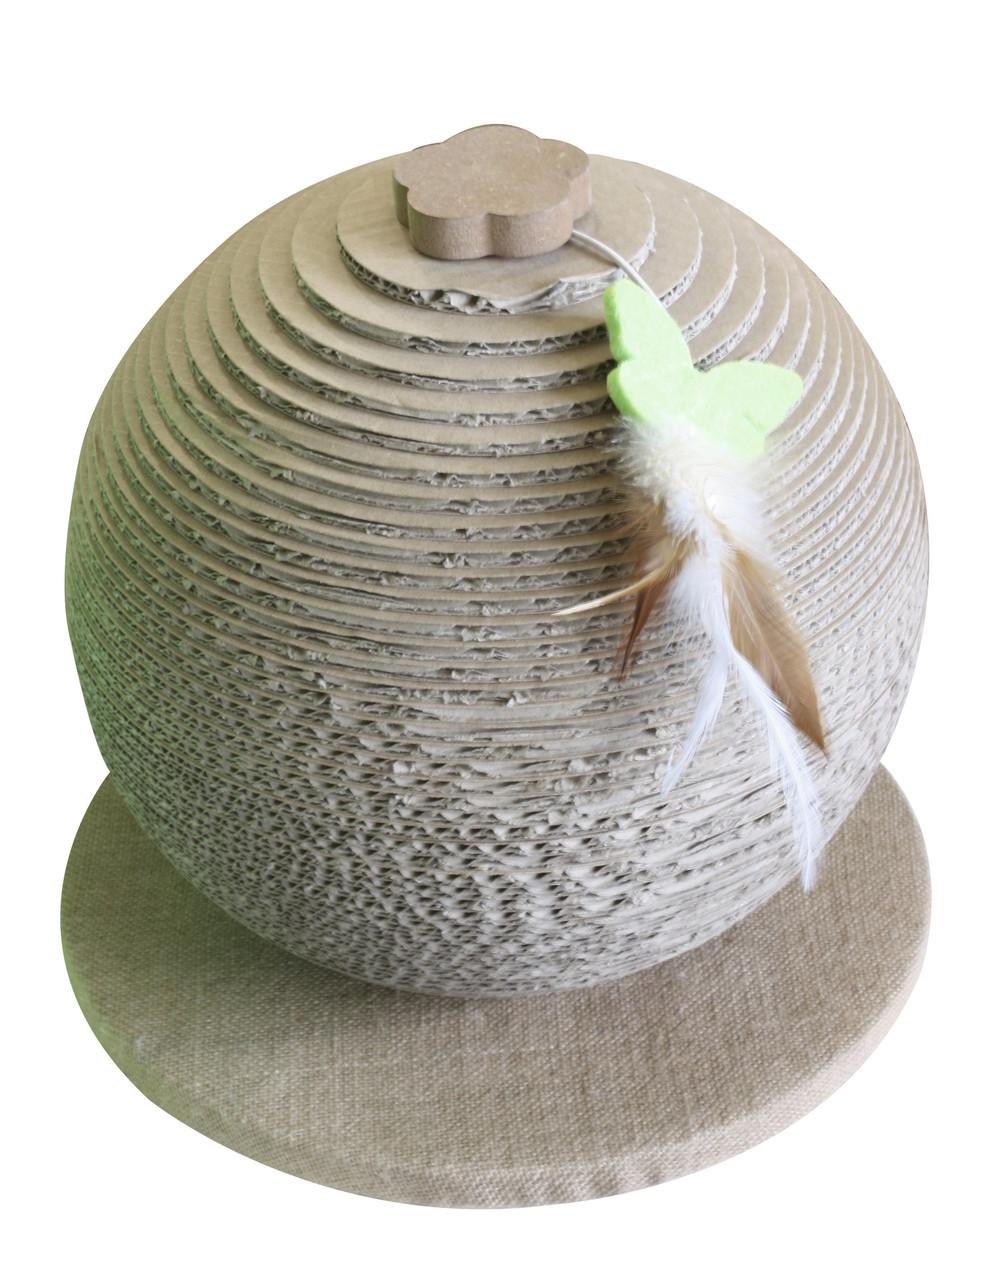 Когтеточка сфера на подставке Croci Papercat Sphere 30*30*33 см (гофрокартон)